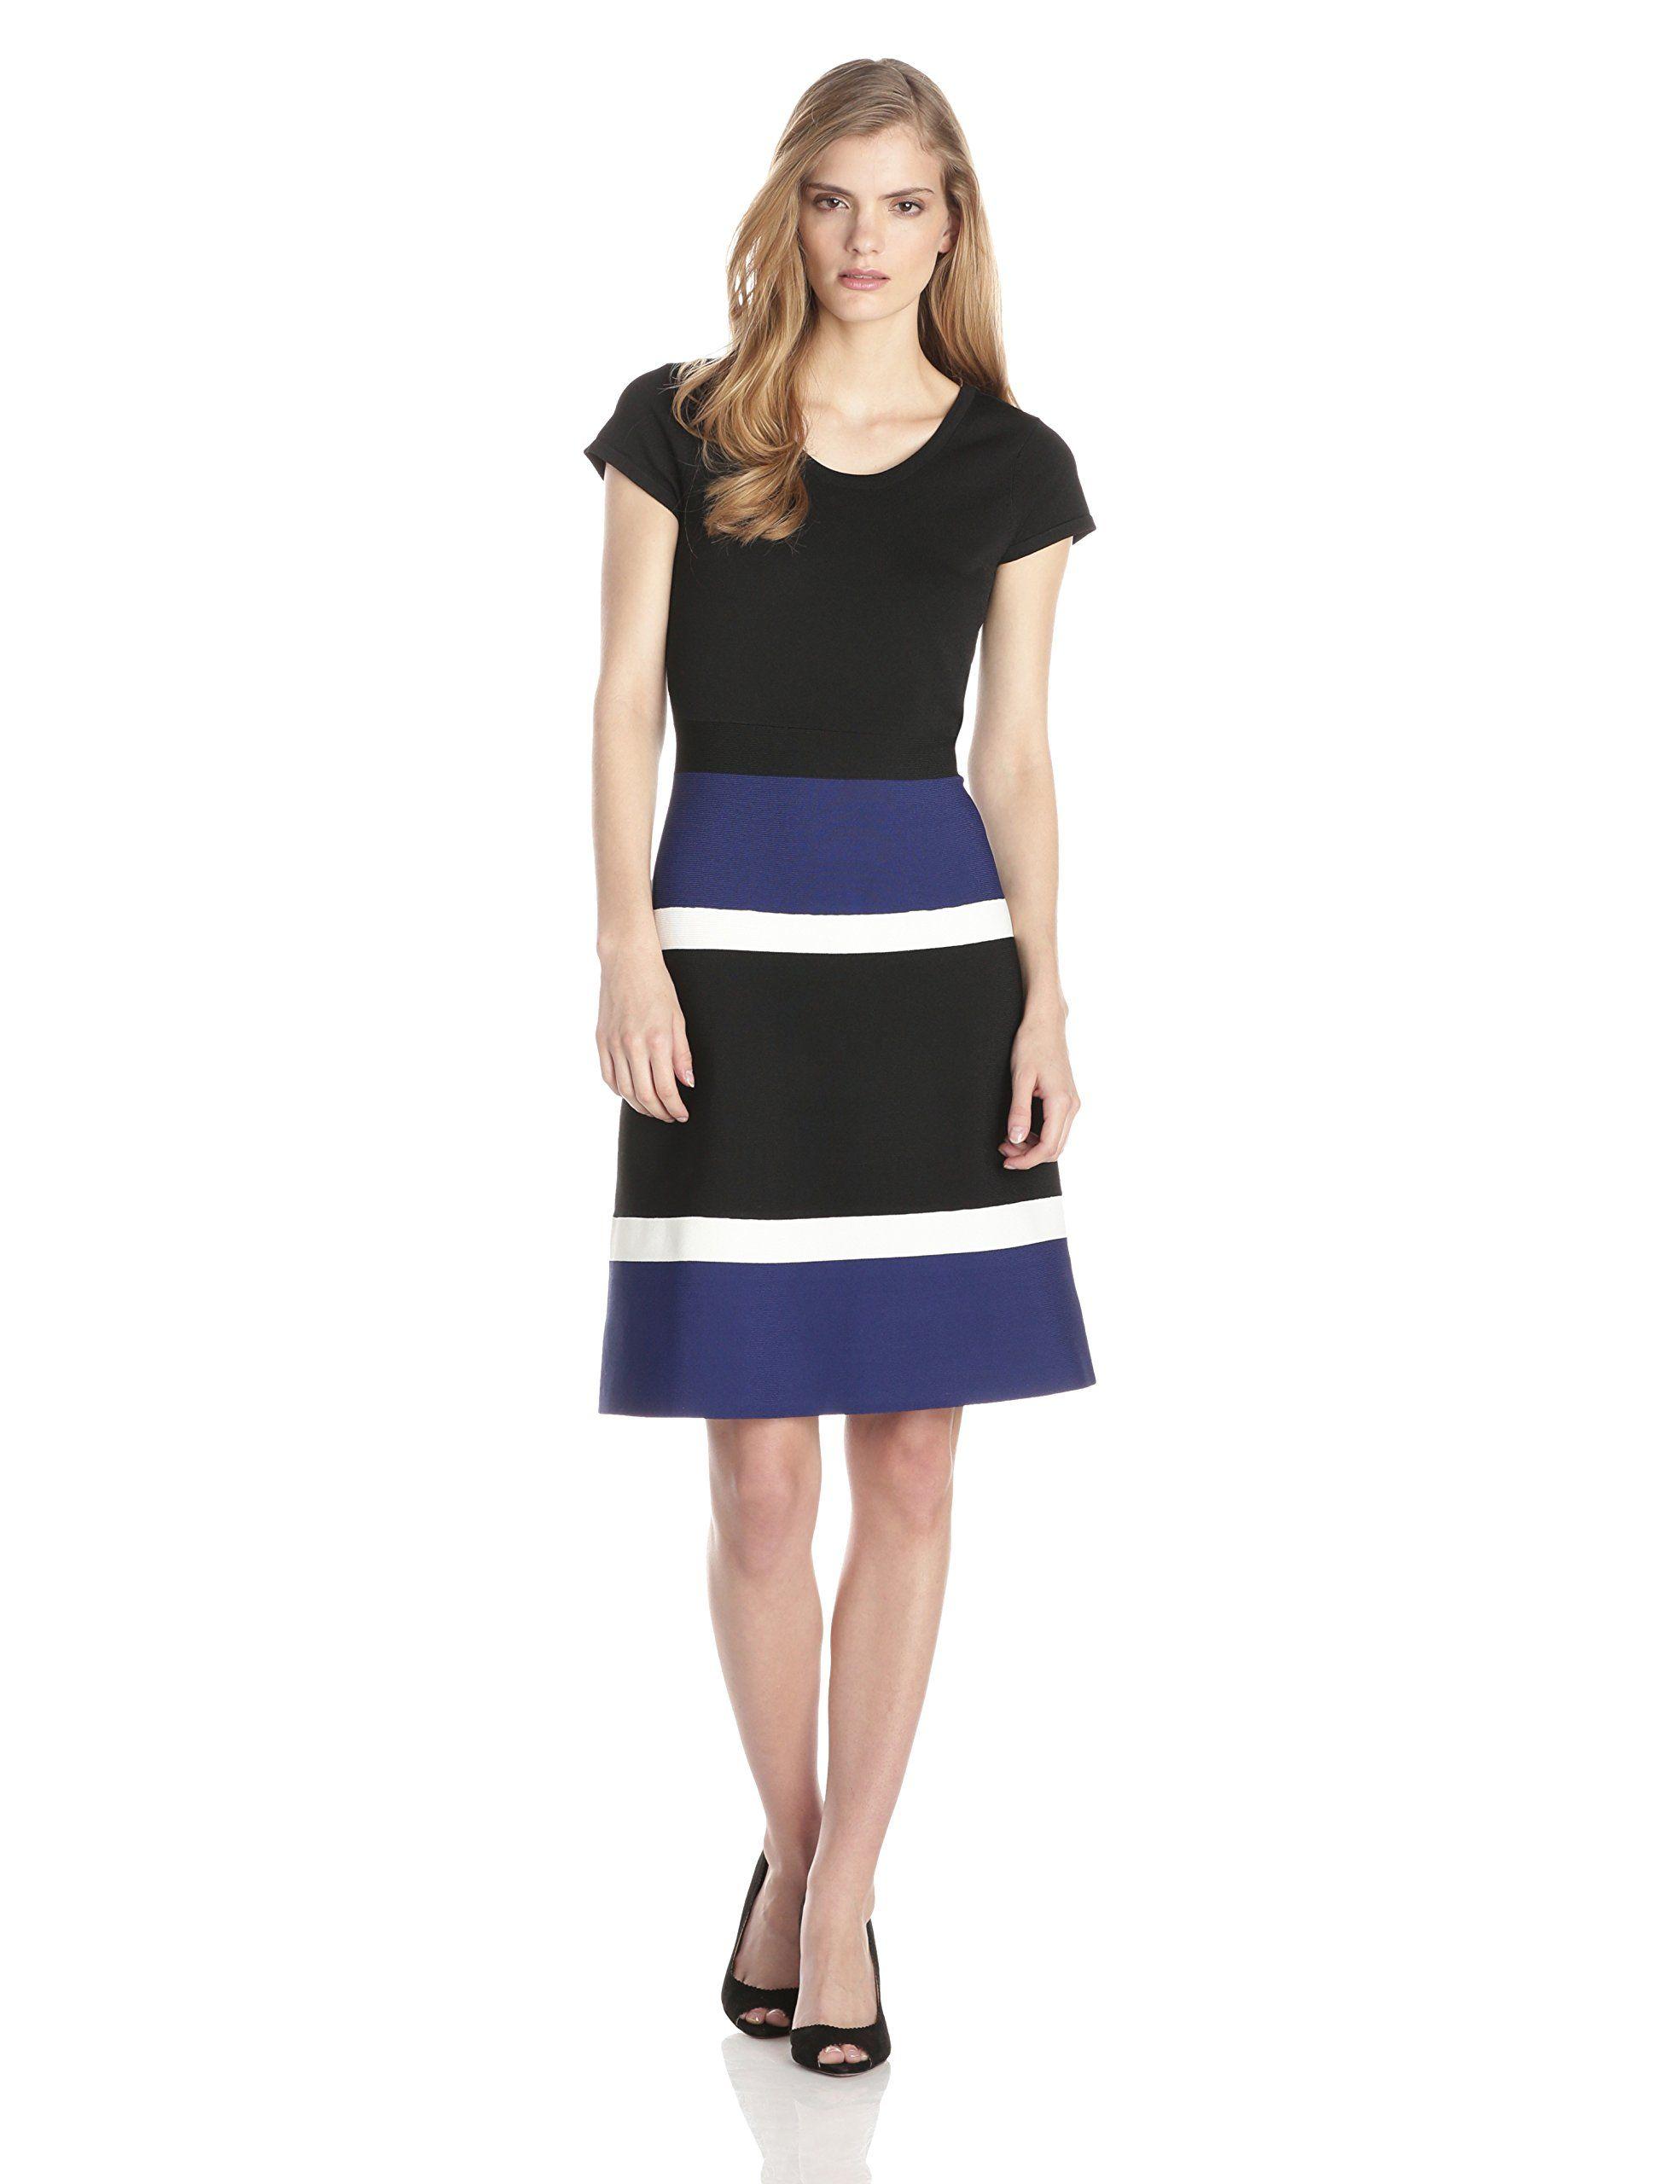 e4d58e16528 Anne Klein Women's Cap Sleeve Colorblocked Dress, Black/Ultramarine/White,  Medium at Amazon Women's Clothing store: